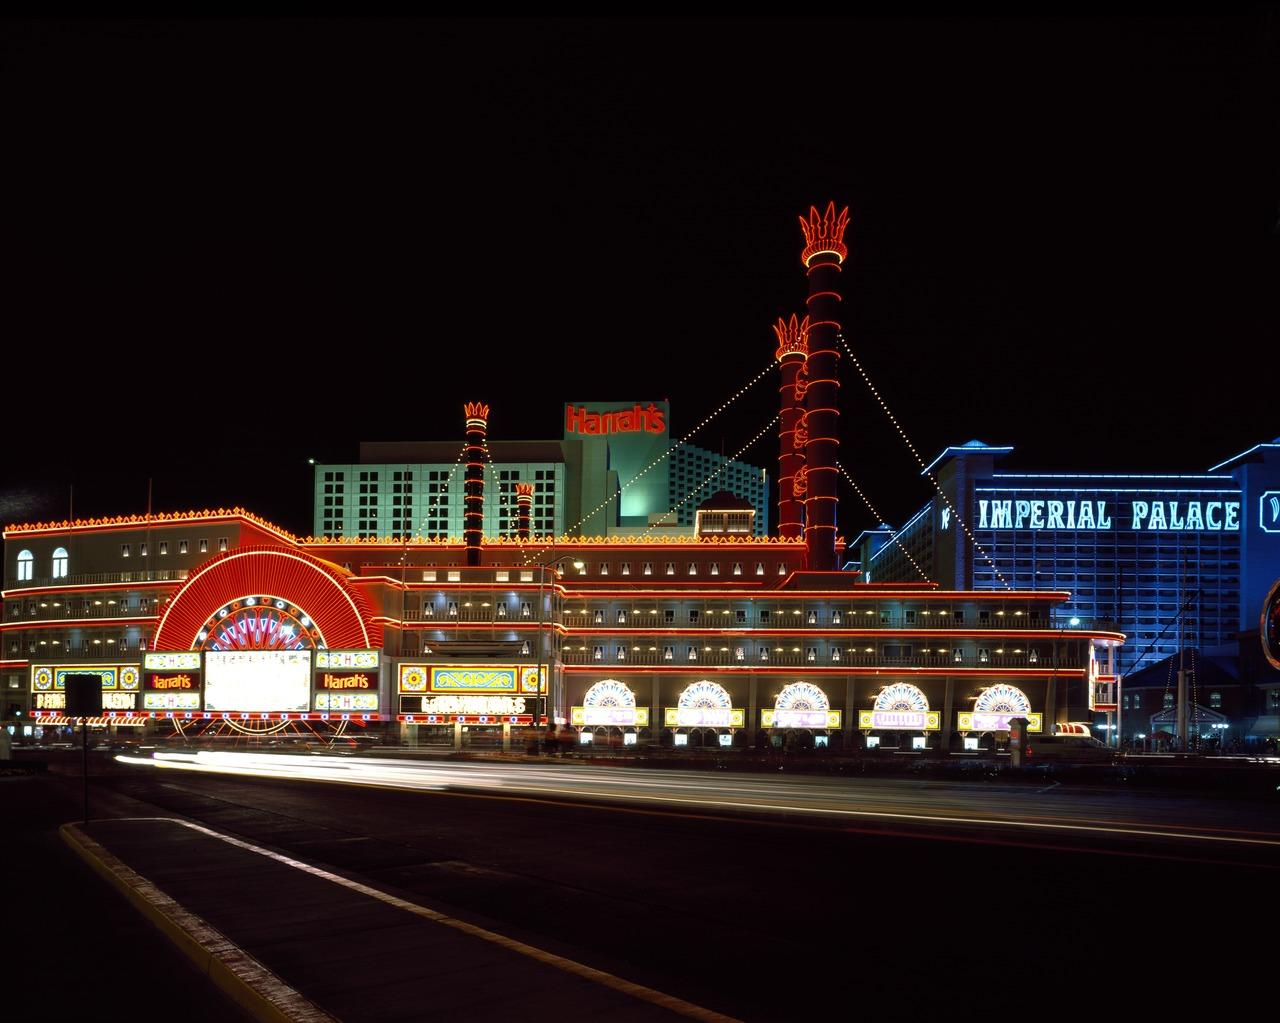 HarrahS Las Vegas Hotel & Casino